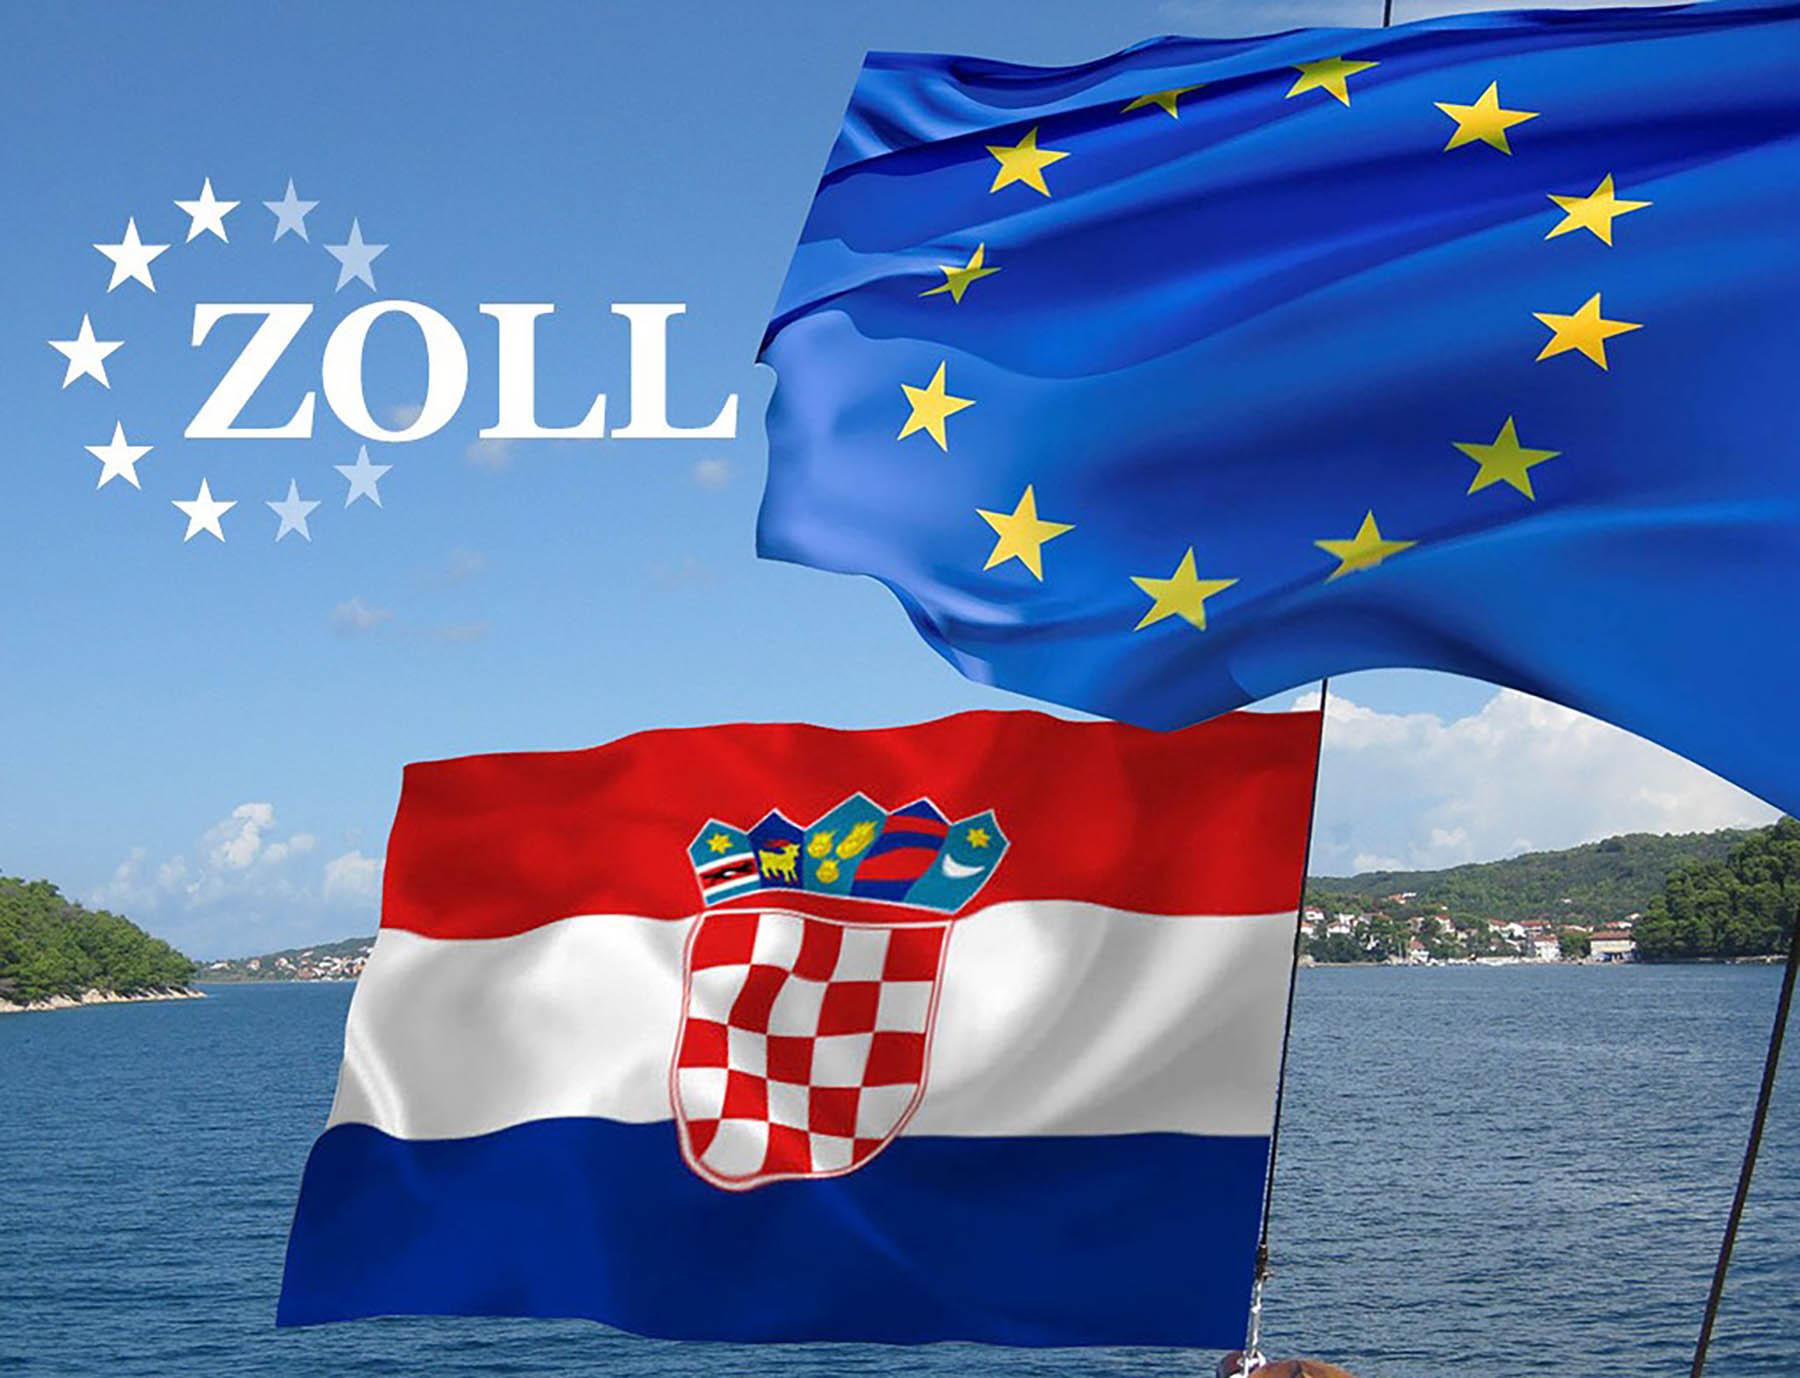 Zollbestimmungen Kroatien | Zollvorschriften Kroatien | von Kroati.de √